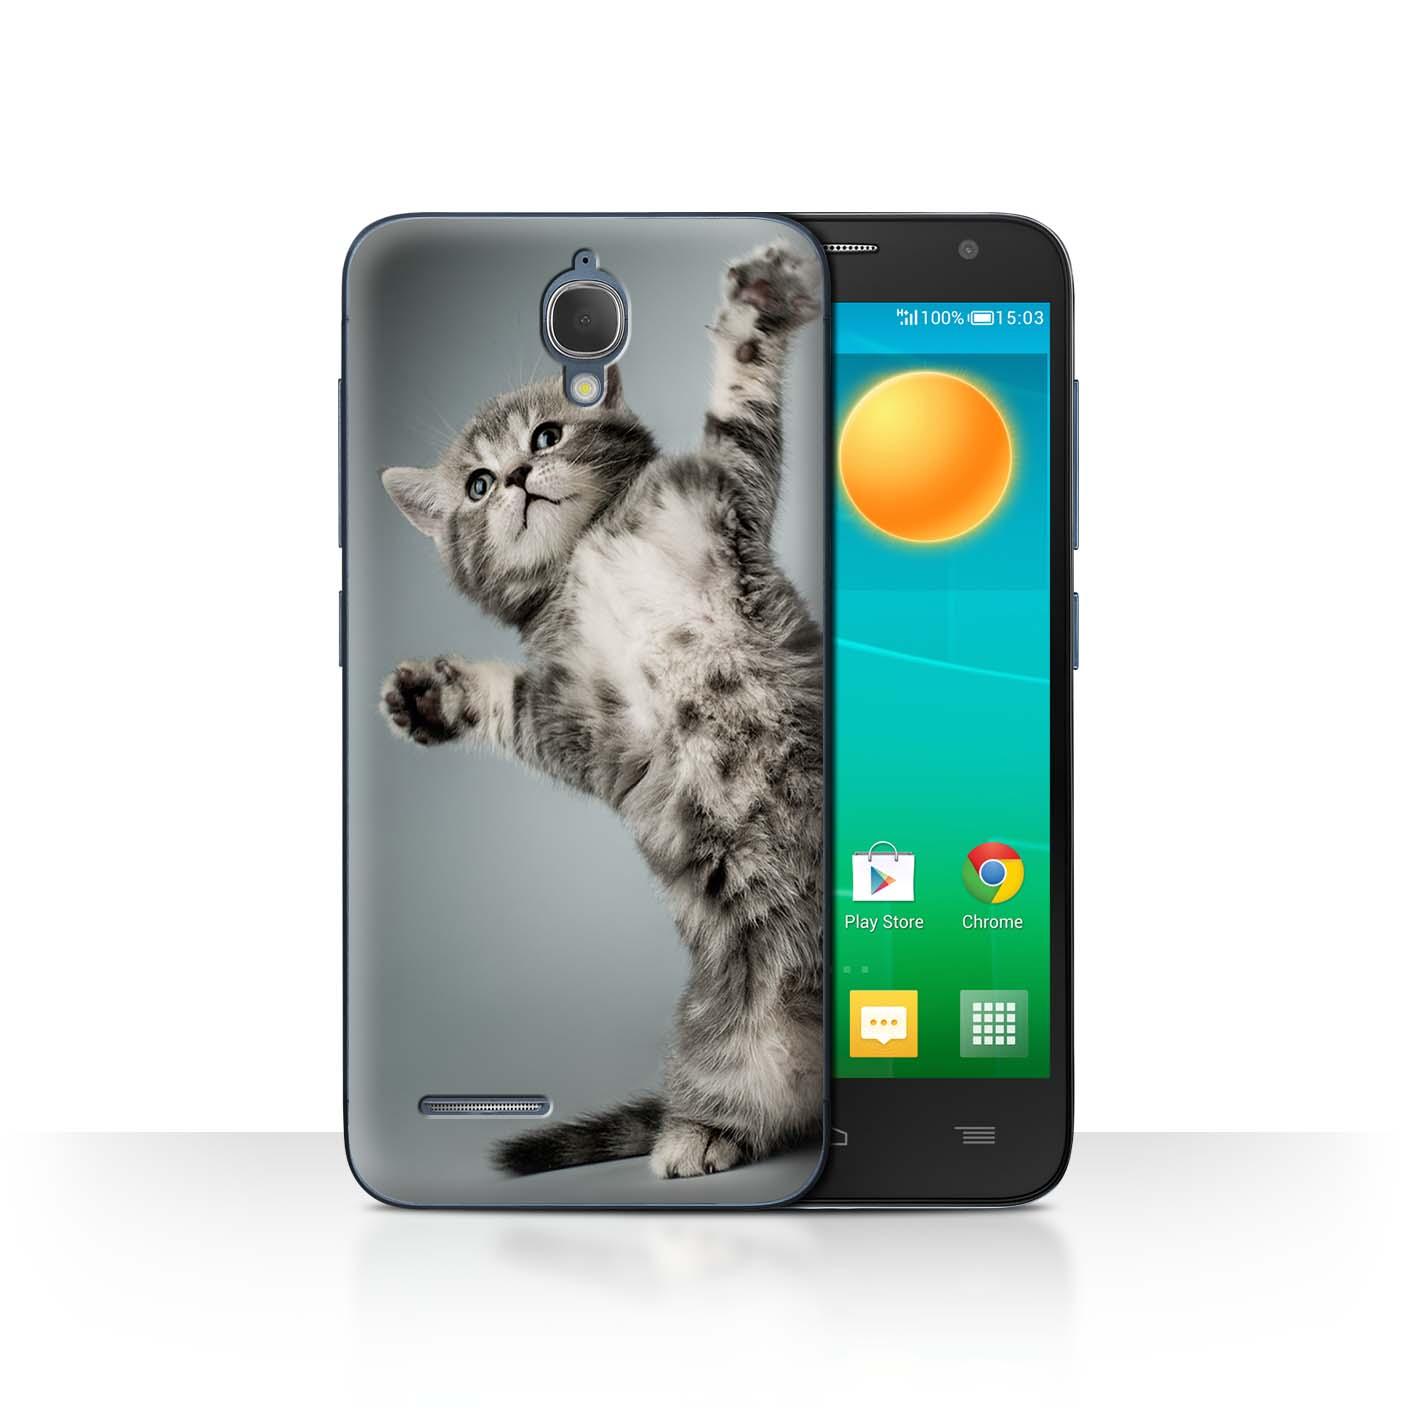 STUFF4-Back-Case-Cover-Skin-for-Alcatel-Idol-2-Mini-Cute-Kittens